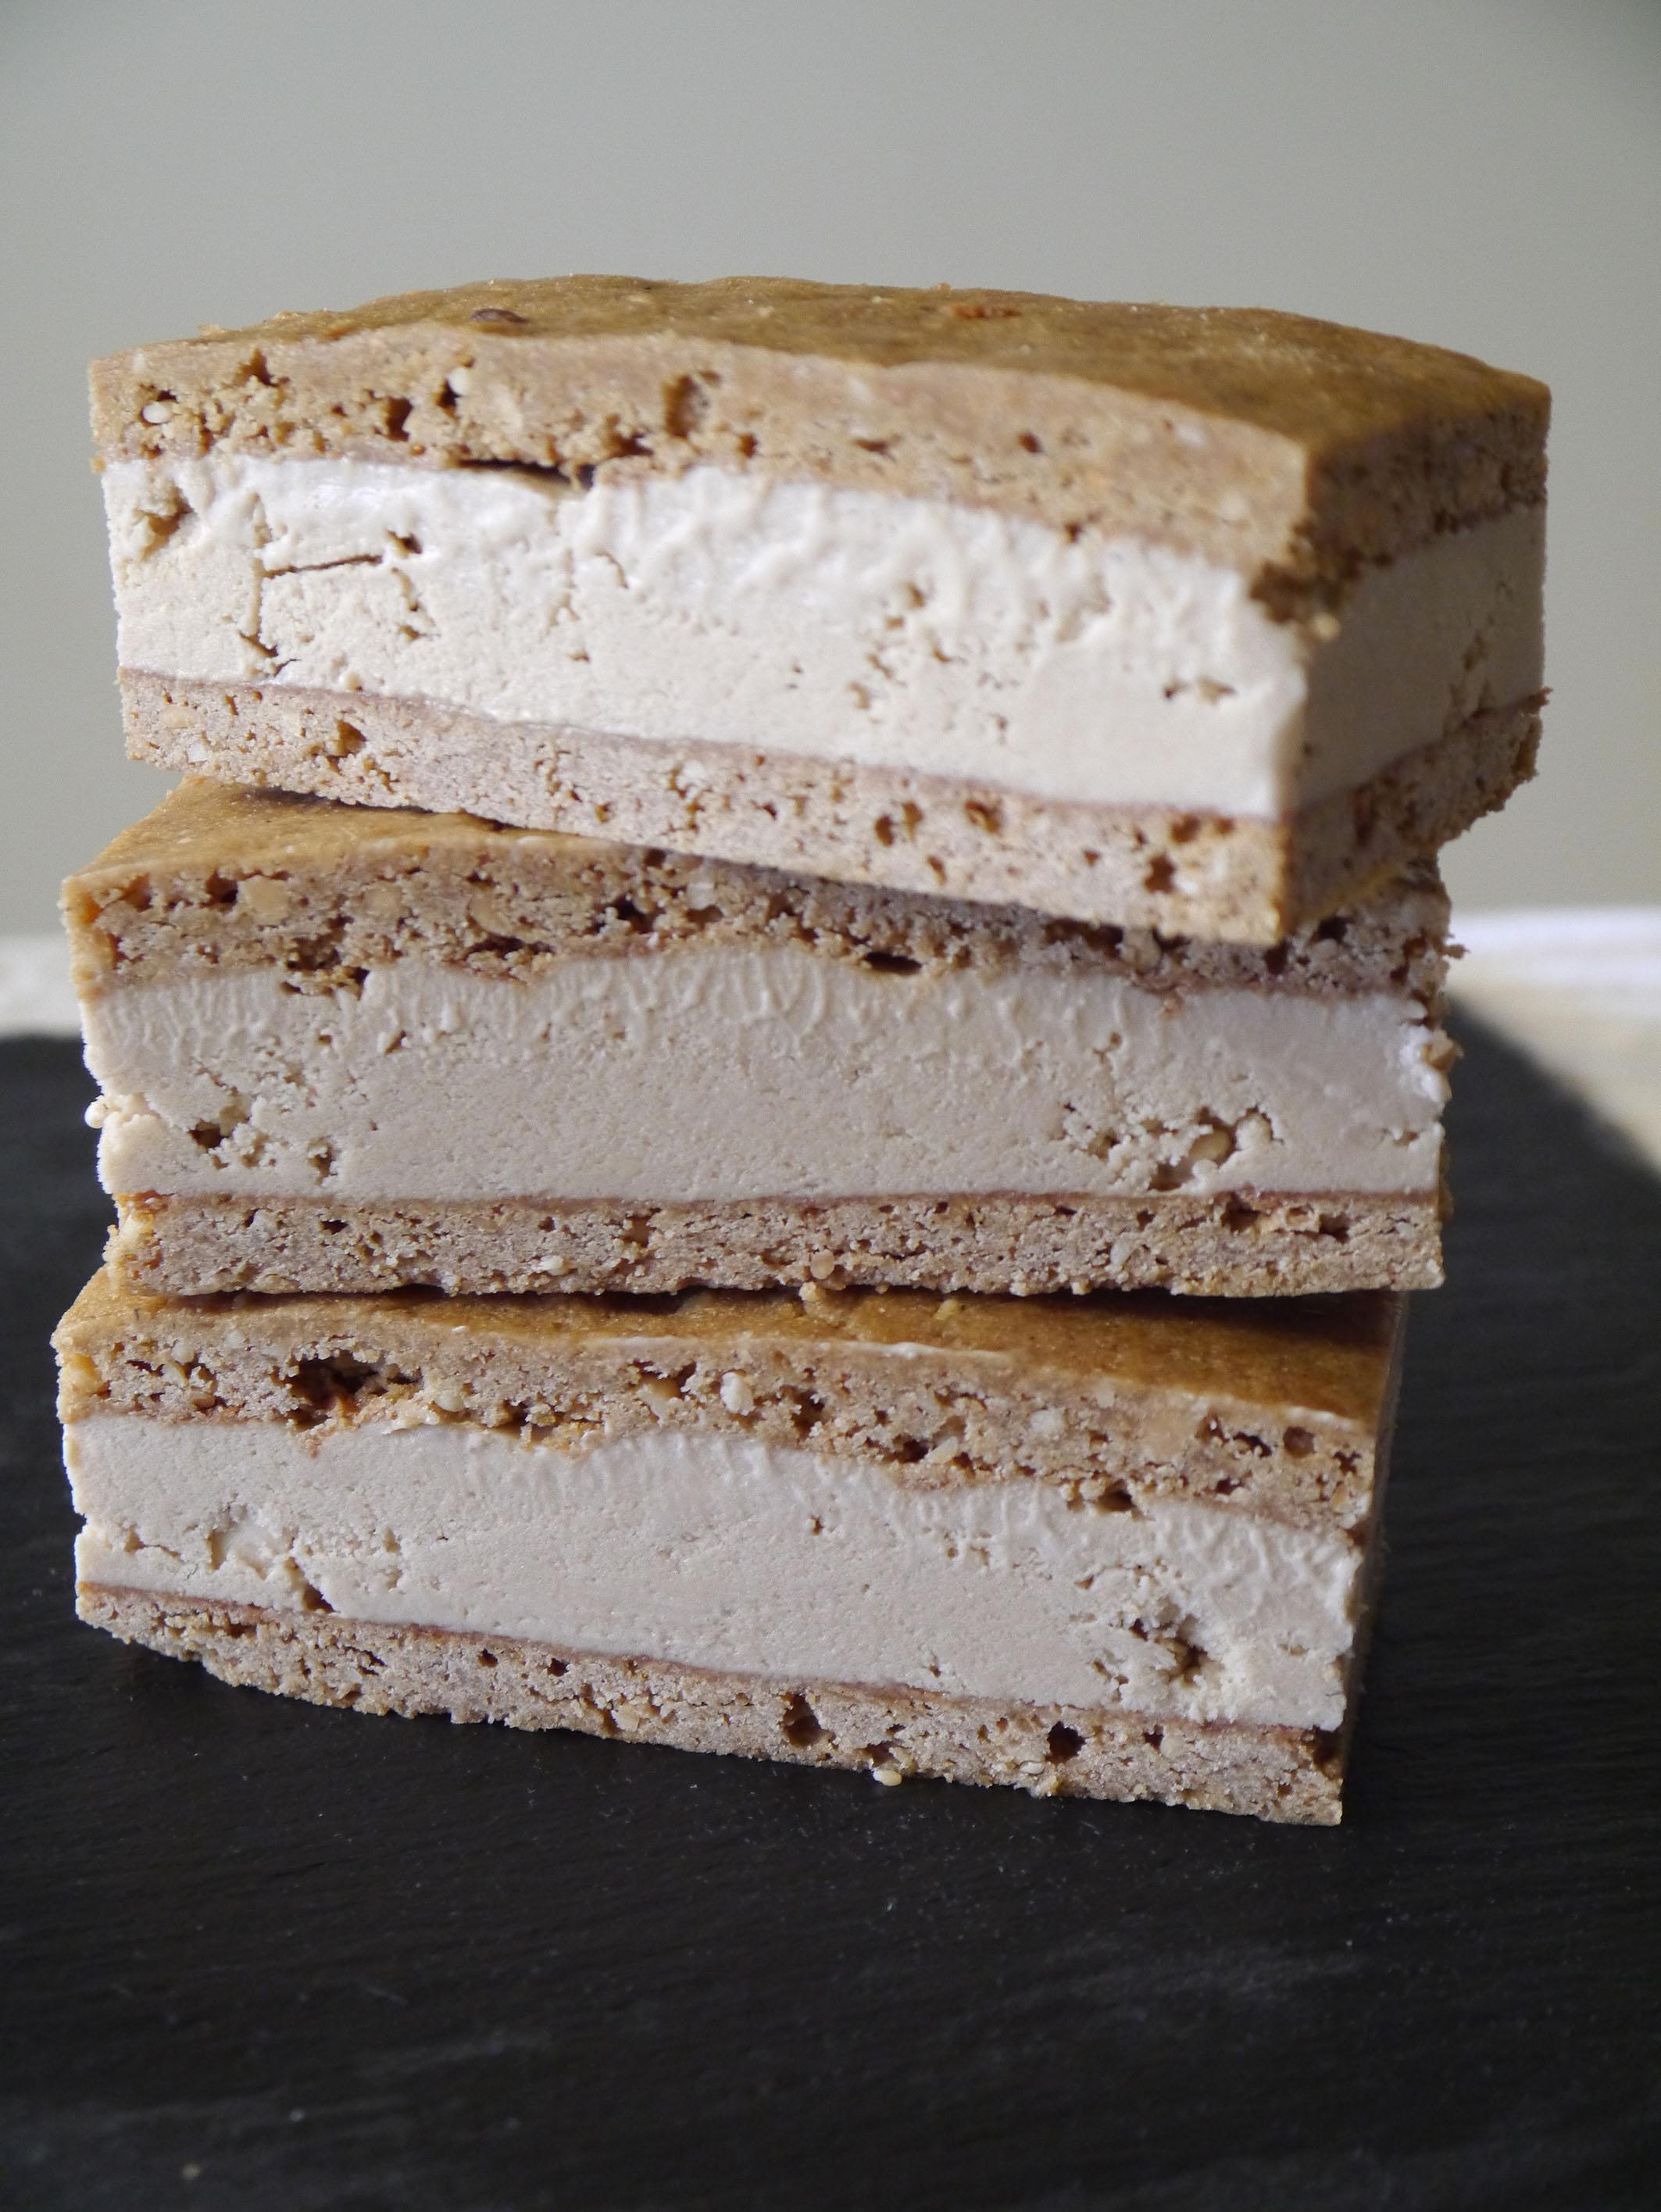 Peanut Butter & Roast Banana Ice Cream Sandwiches